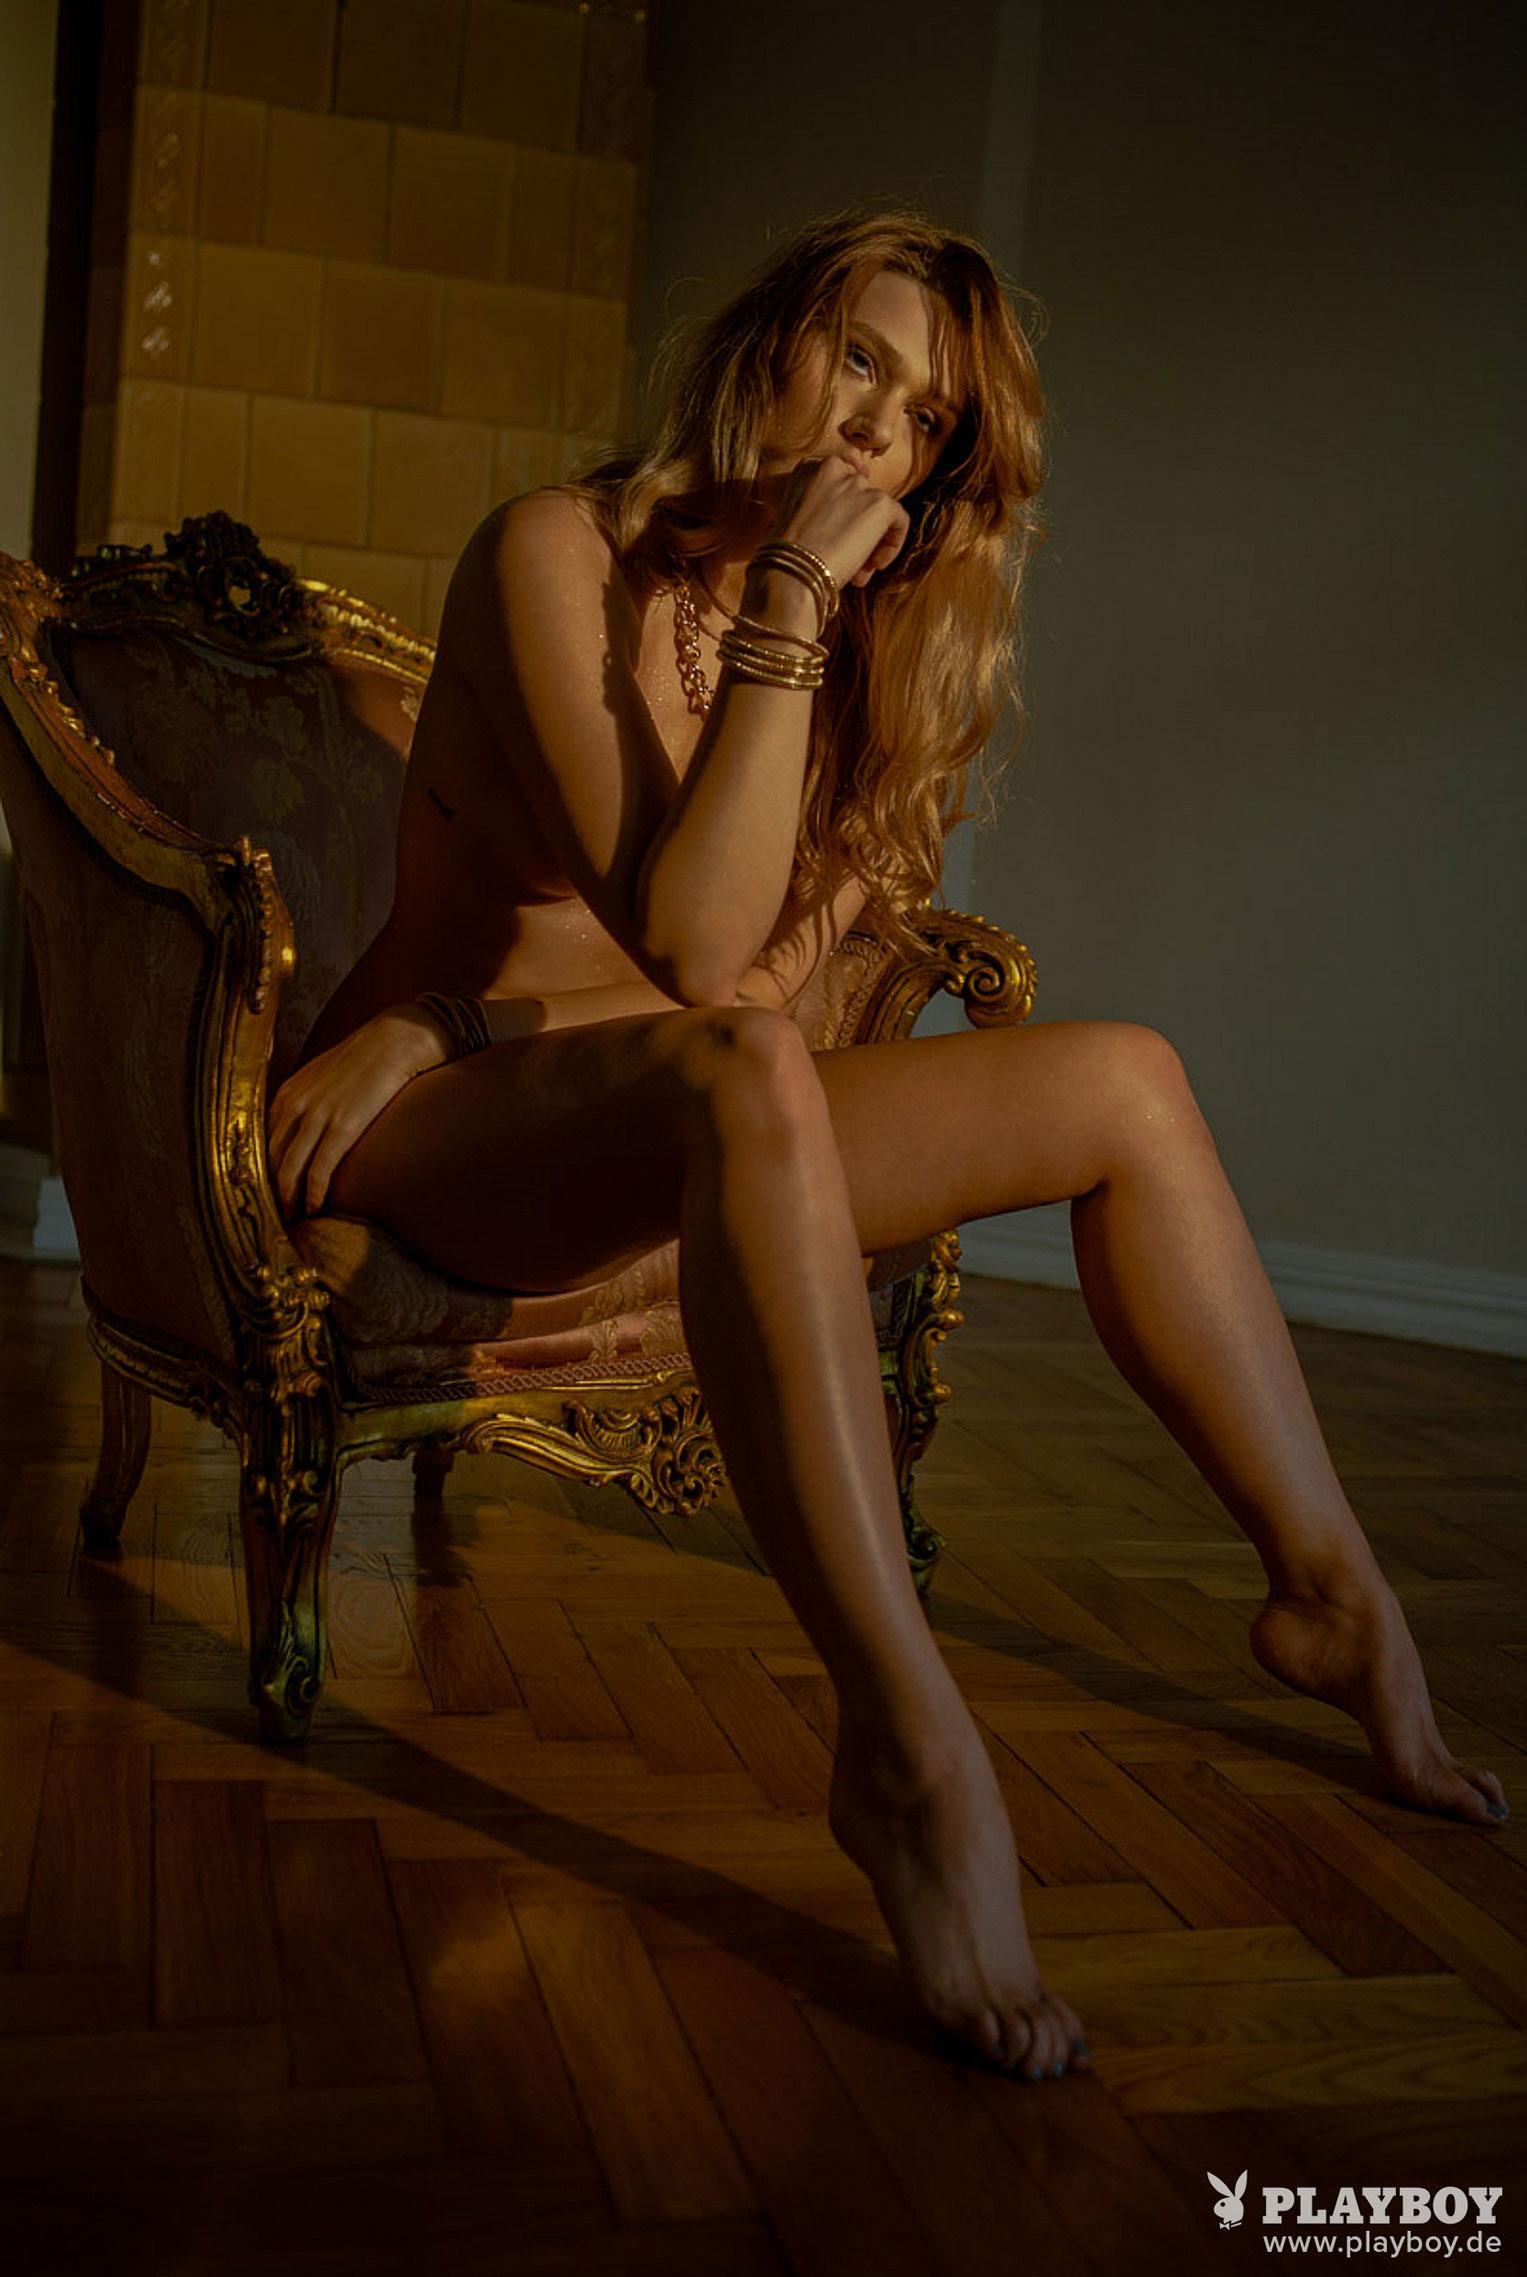 Девушка месяца Playboy Германия декабрь 2019 - Лена Беднарска / фото 17